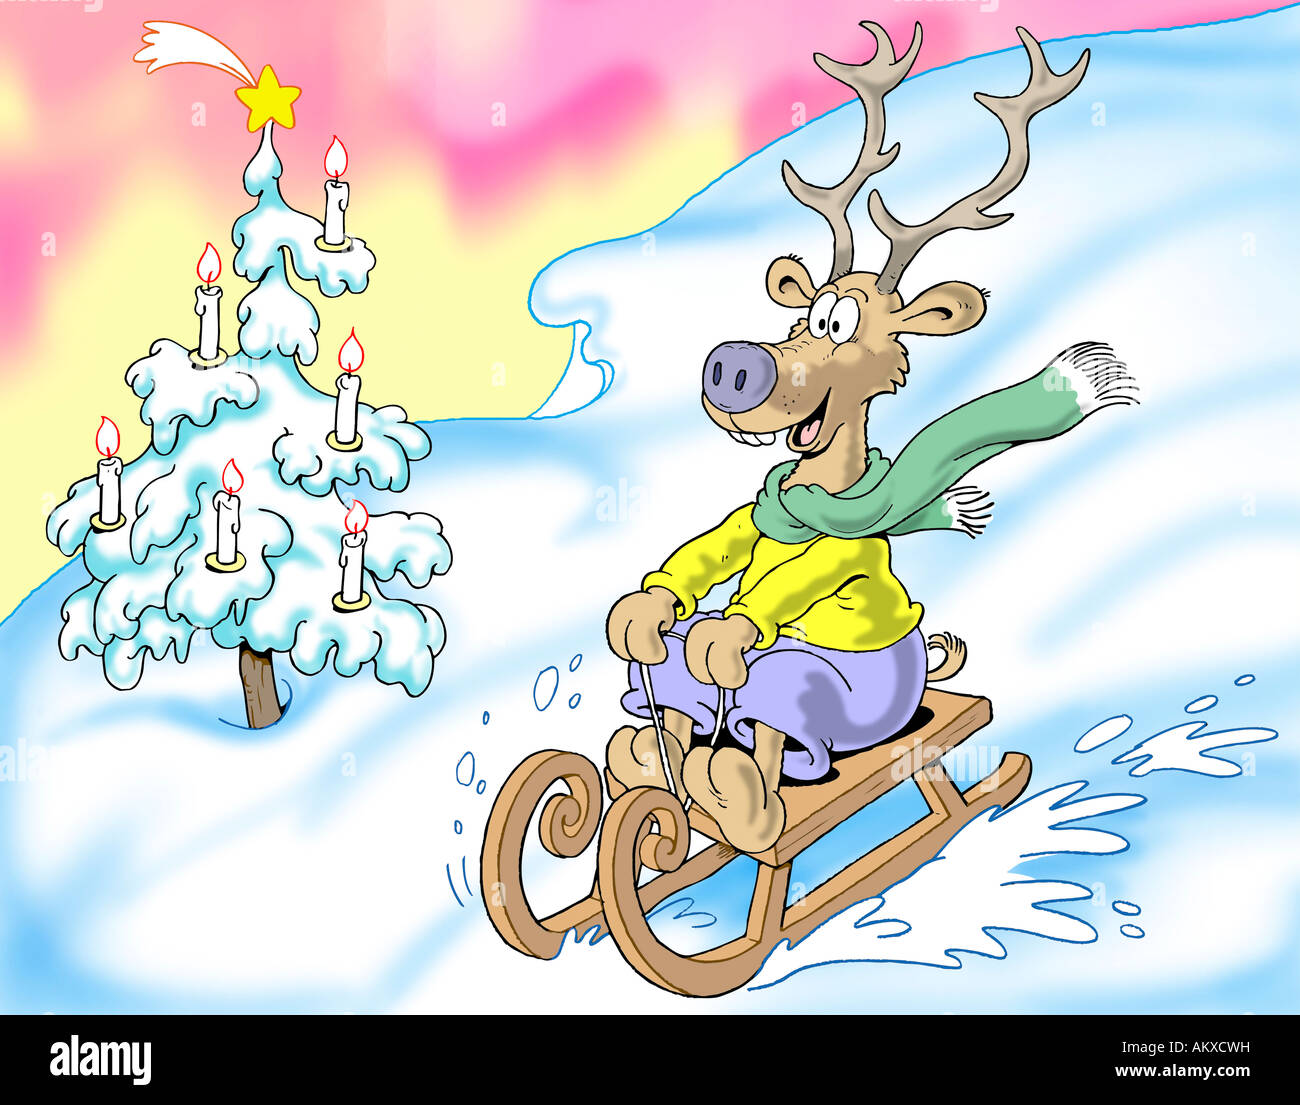 La luge joyeux renne, illustration Photo Stock